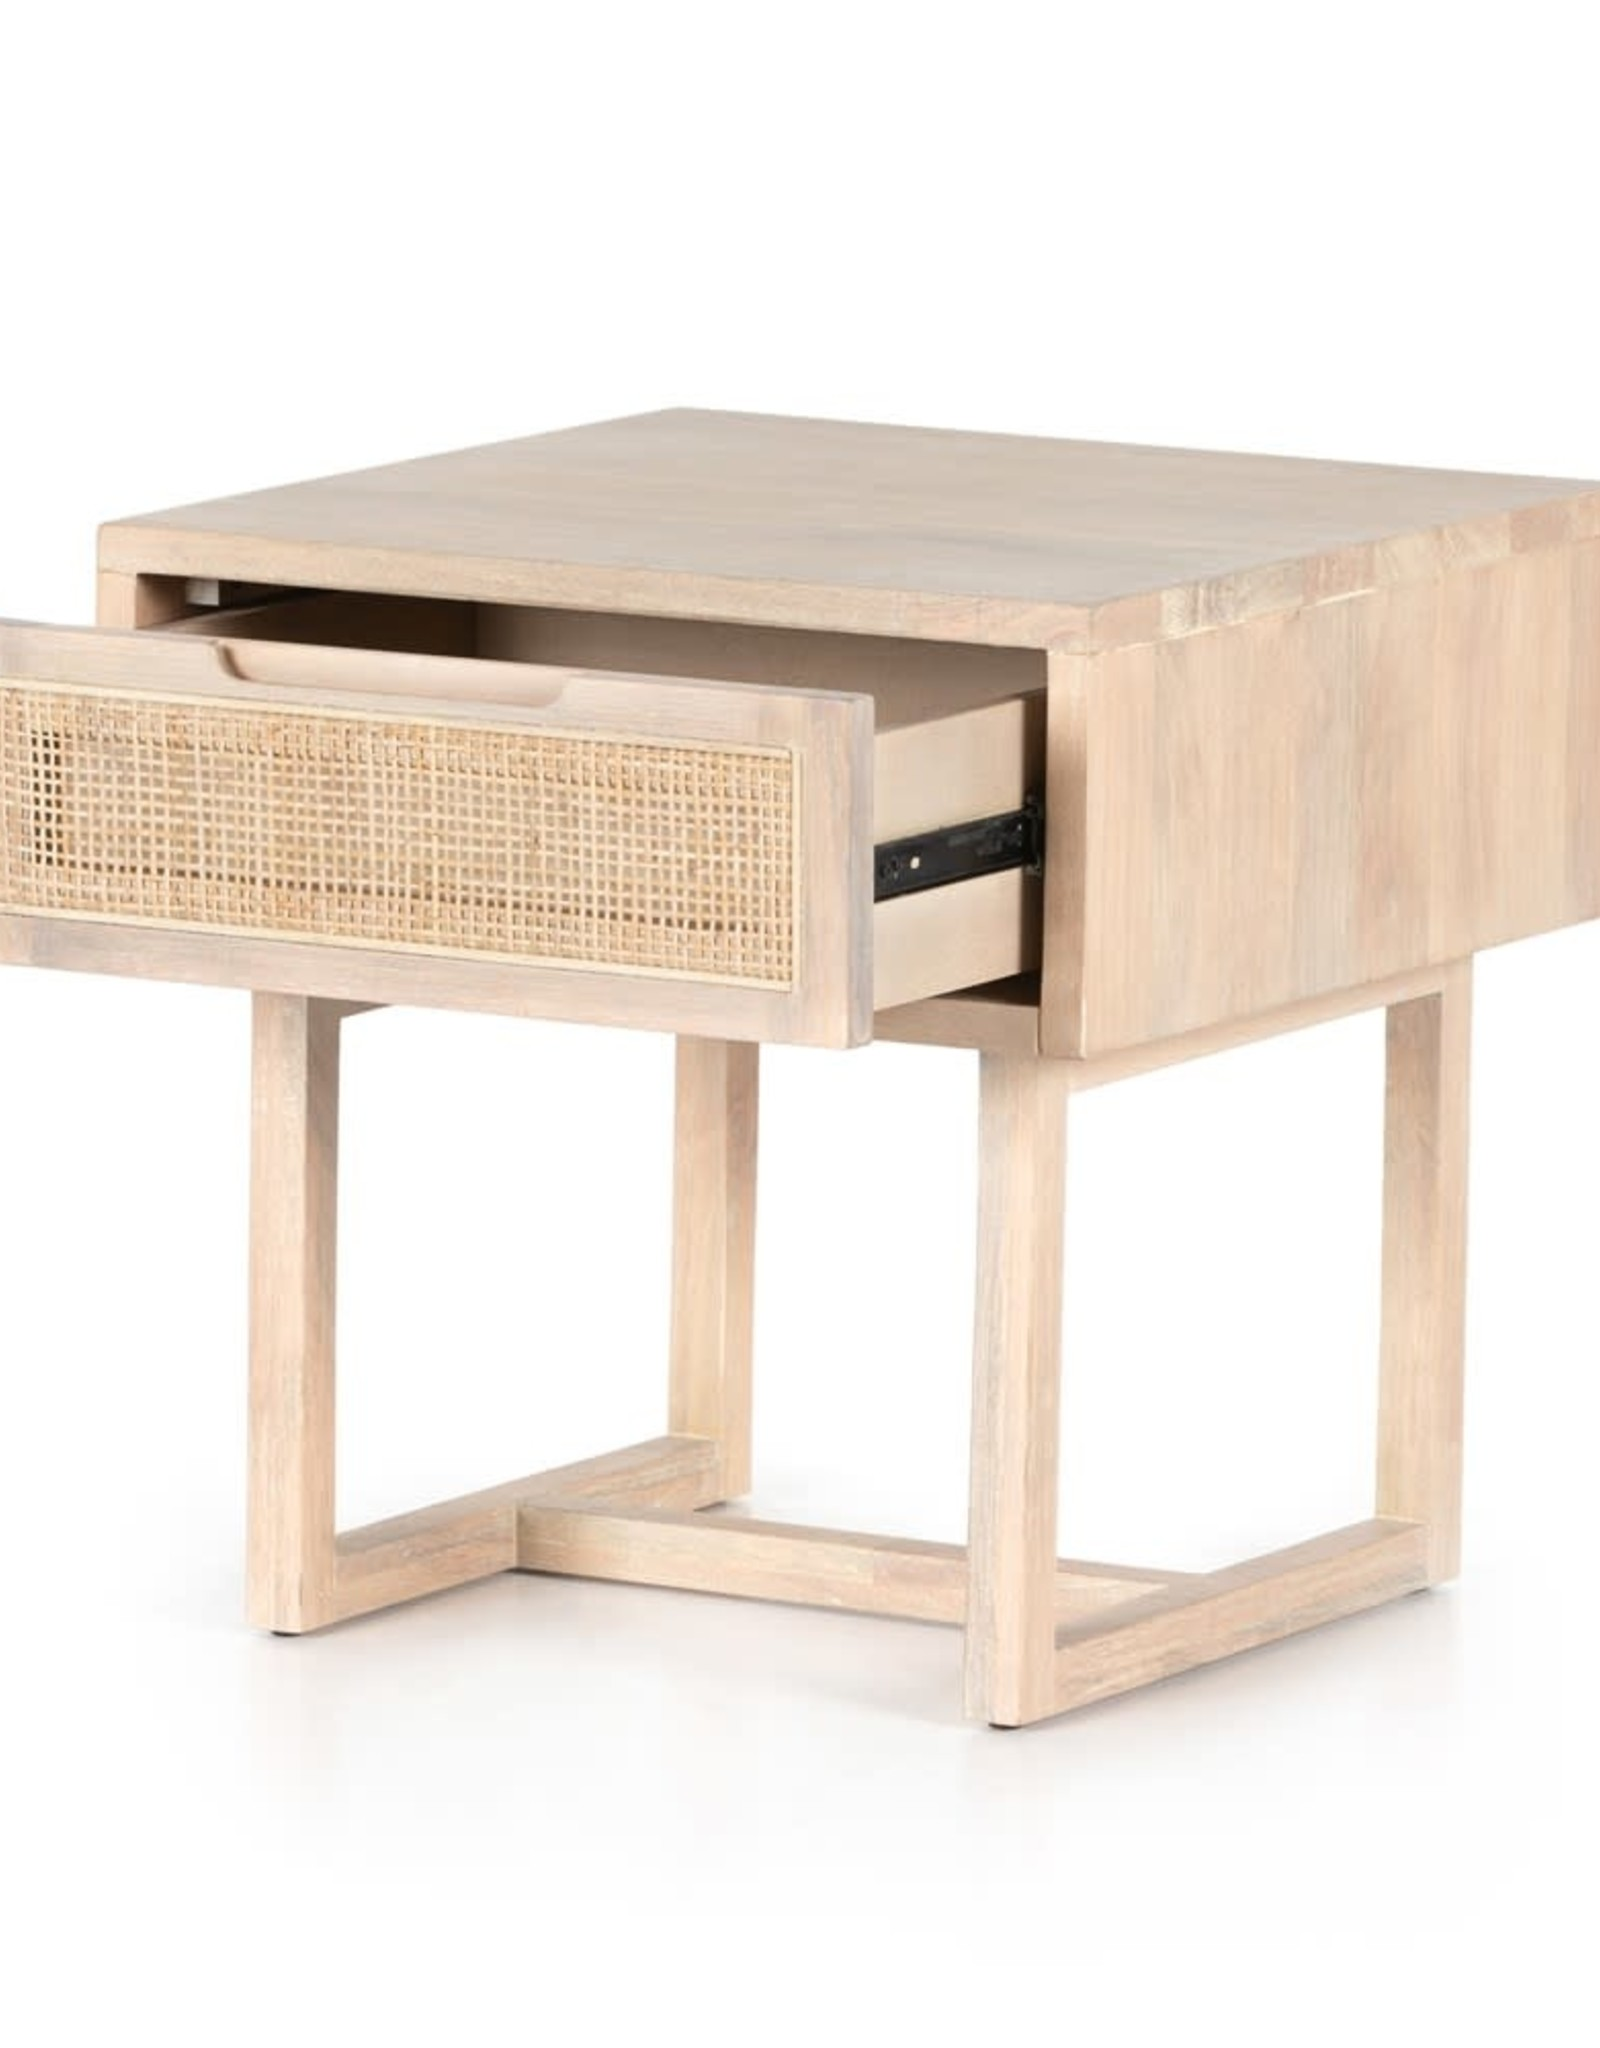 TABLE END CLARITA WHITE WASH MANGO